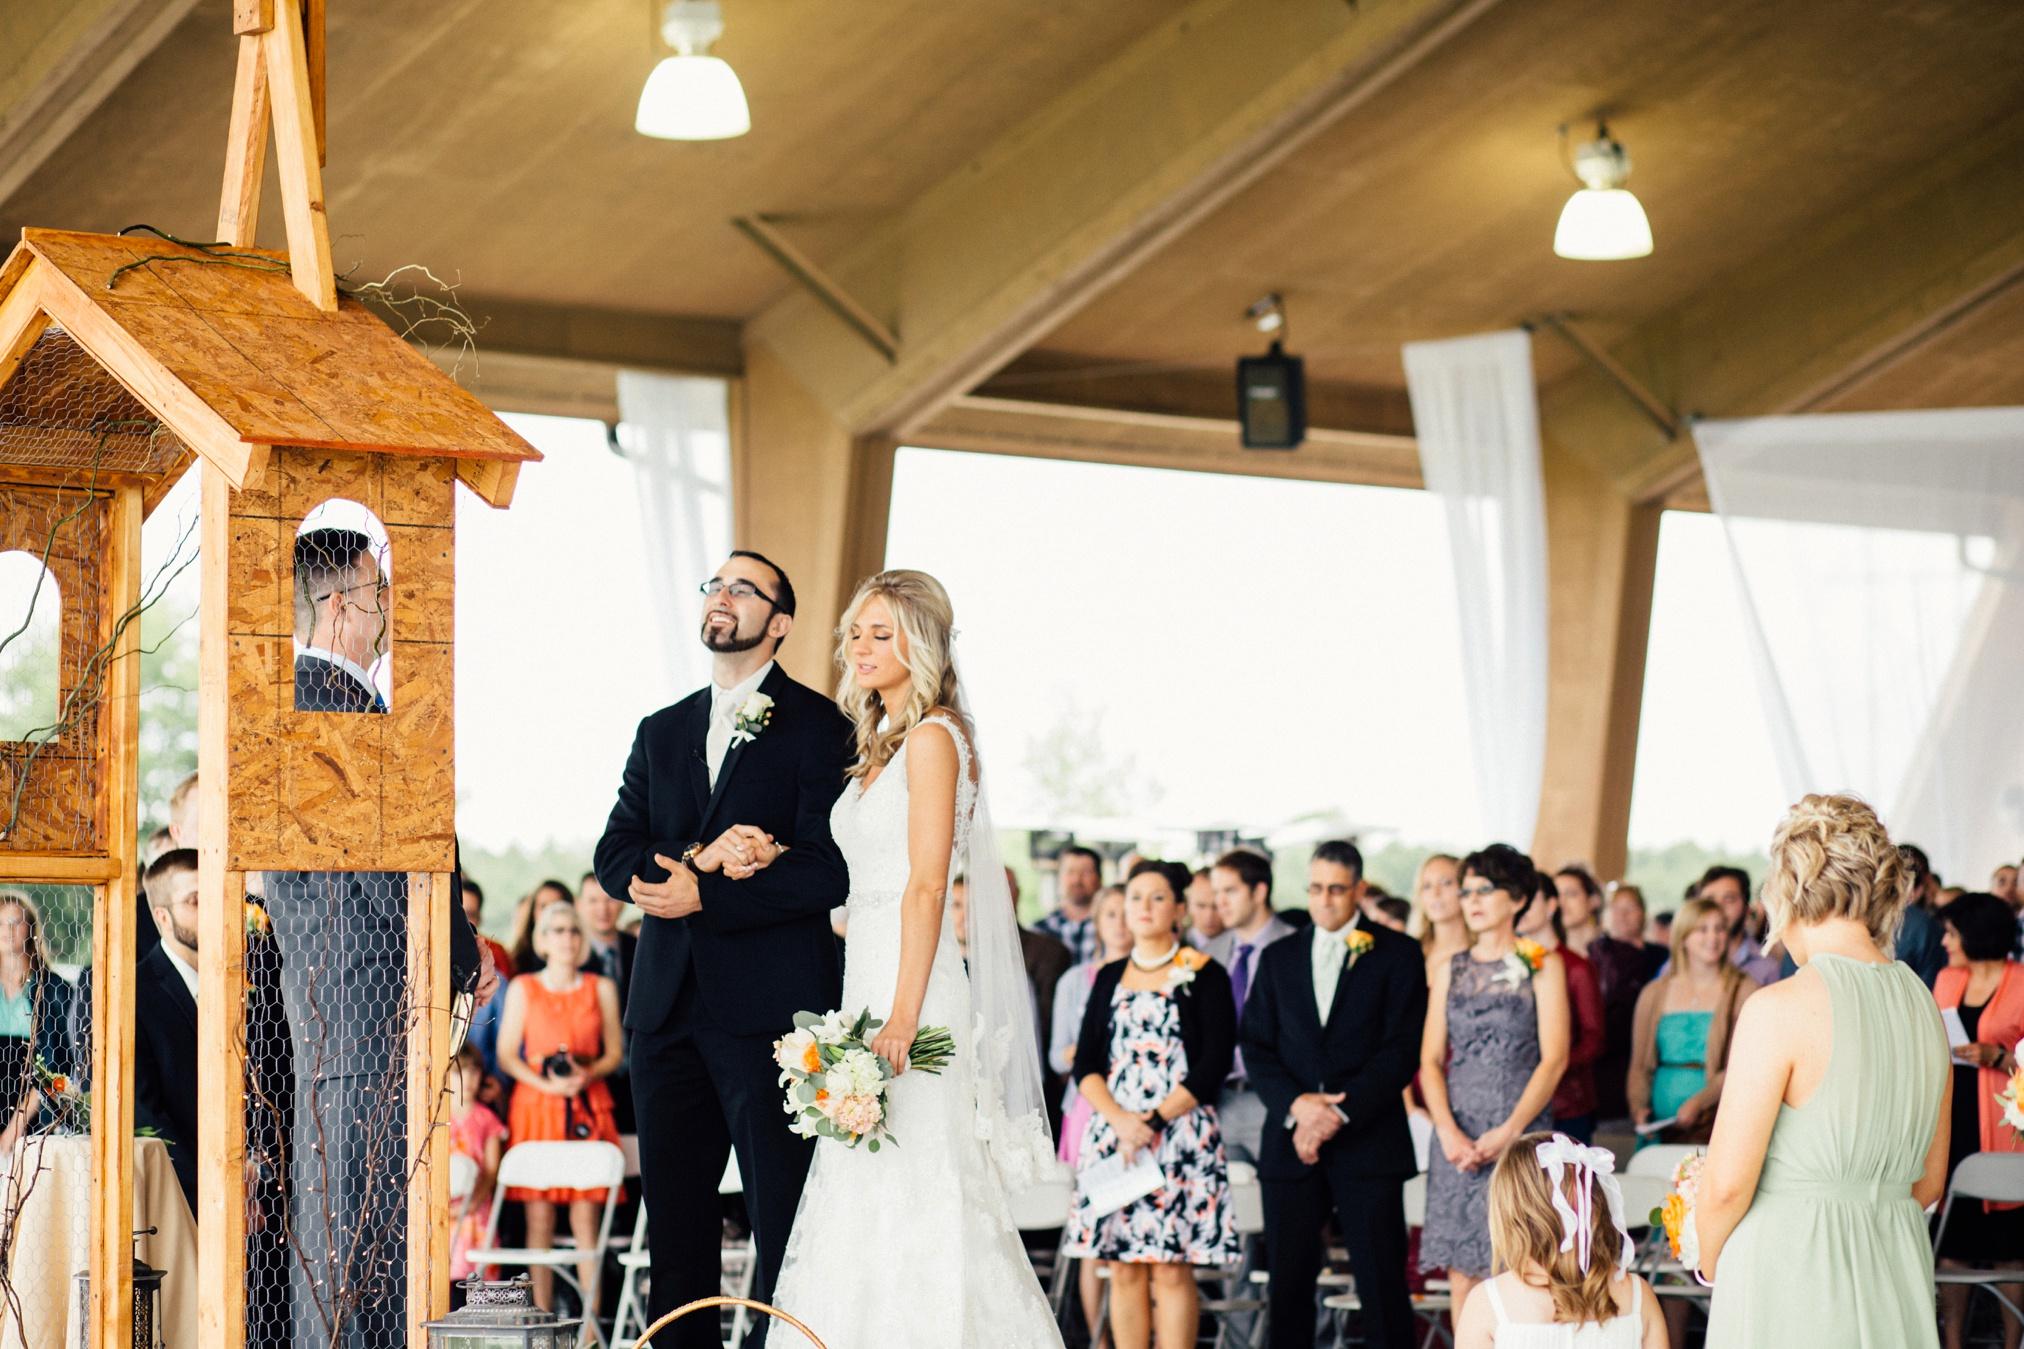 schmid_wedding-424.jpg